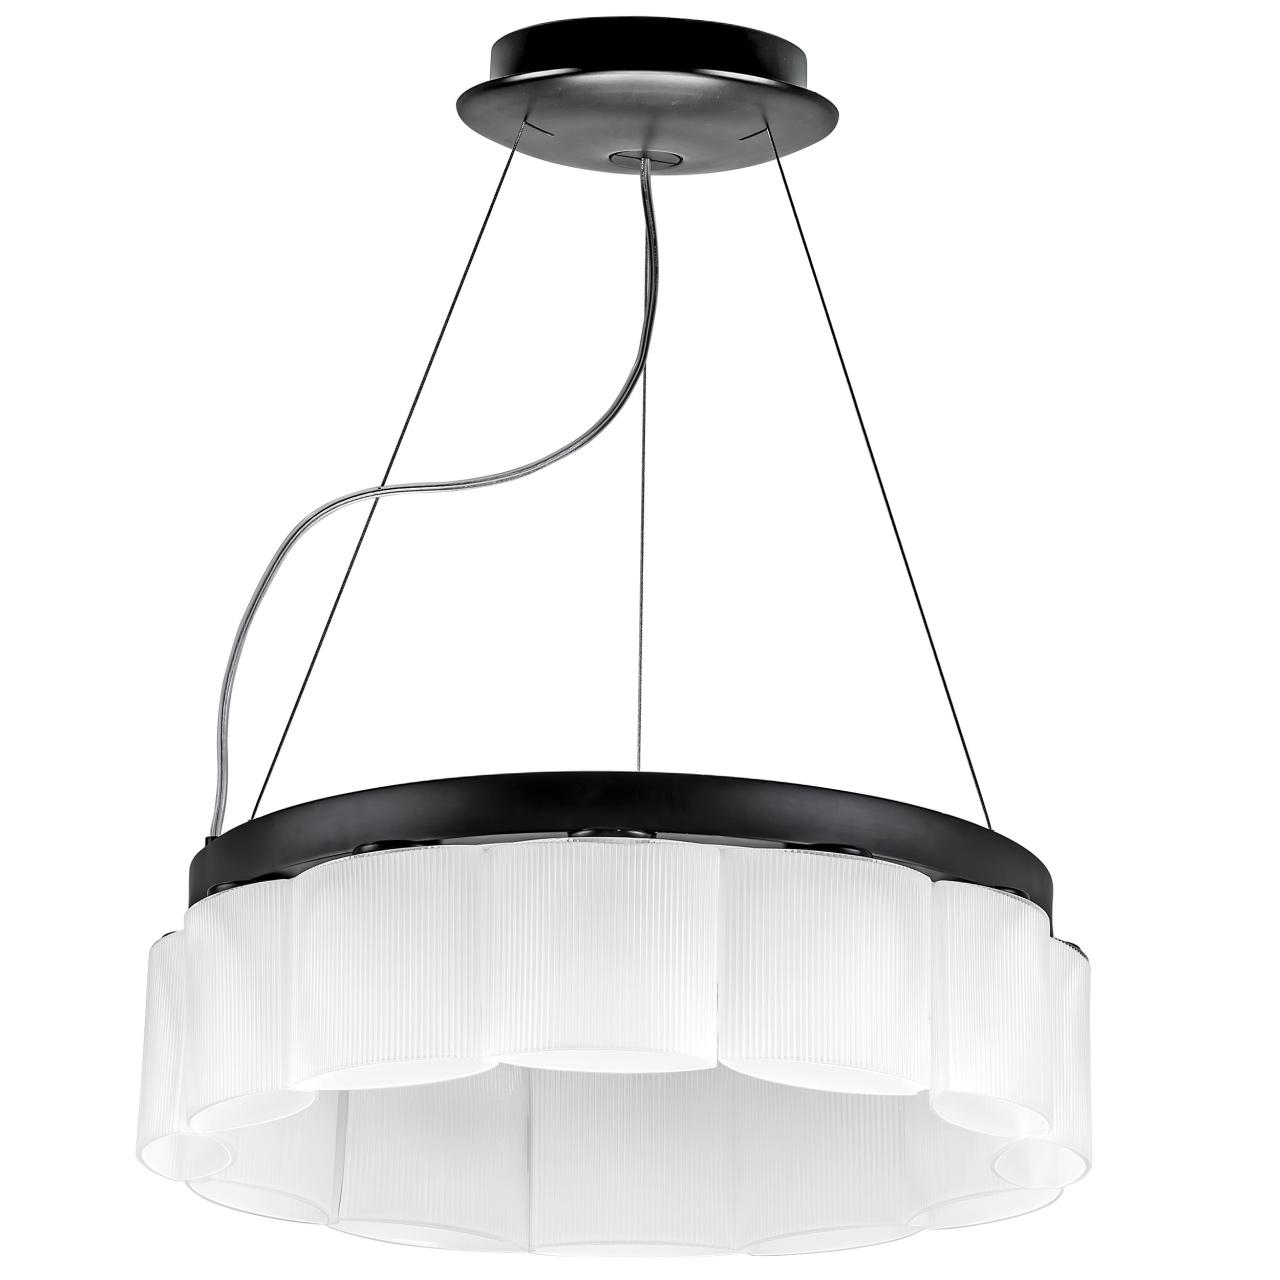 Люстра подвесная Nibbler 12х6W (Led) G9 черный / белый Lightstar 812126